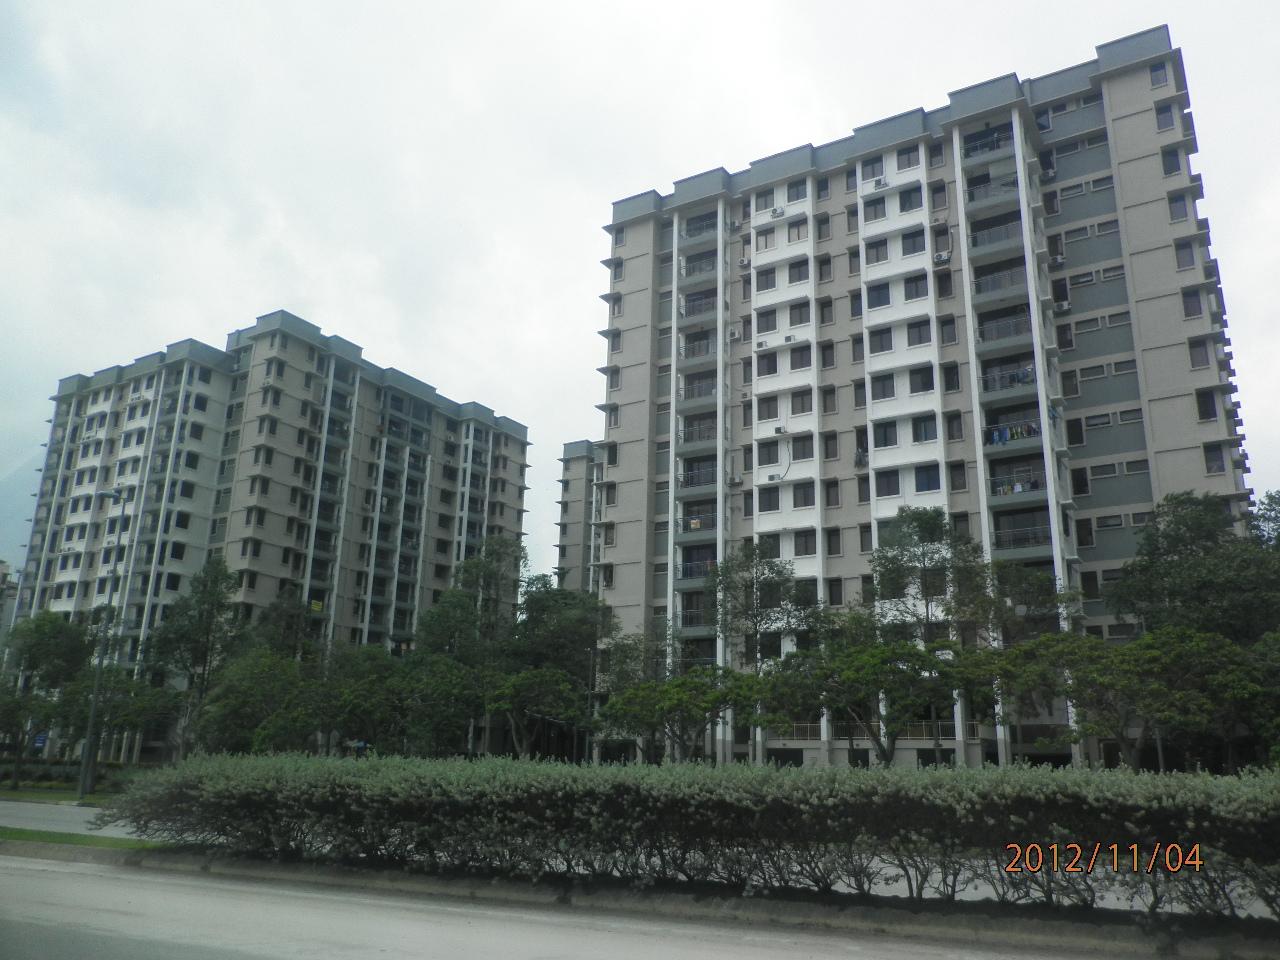 Cyberia Smarthomes Condo Cyberjaya Apartment For sale!